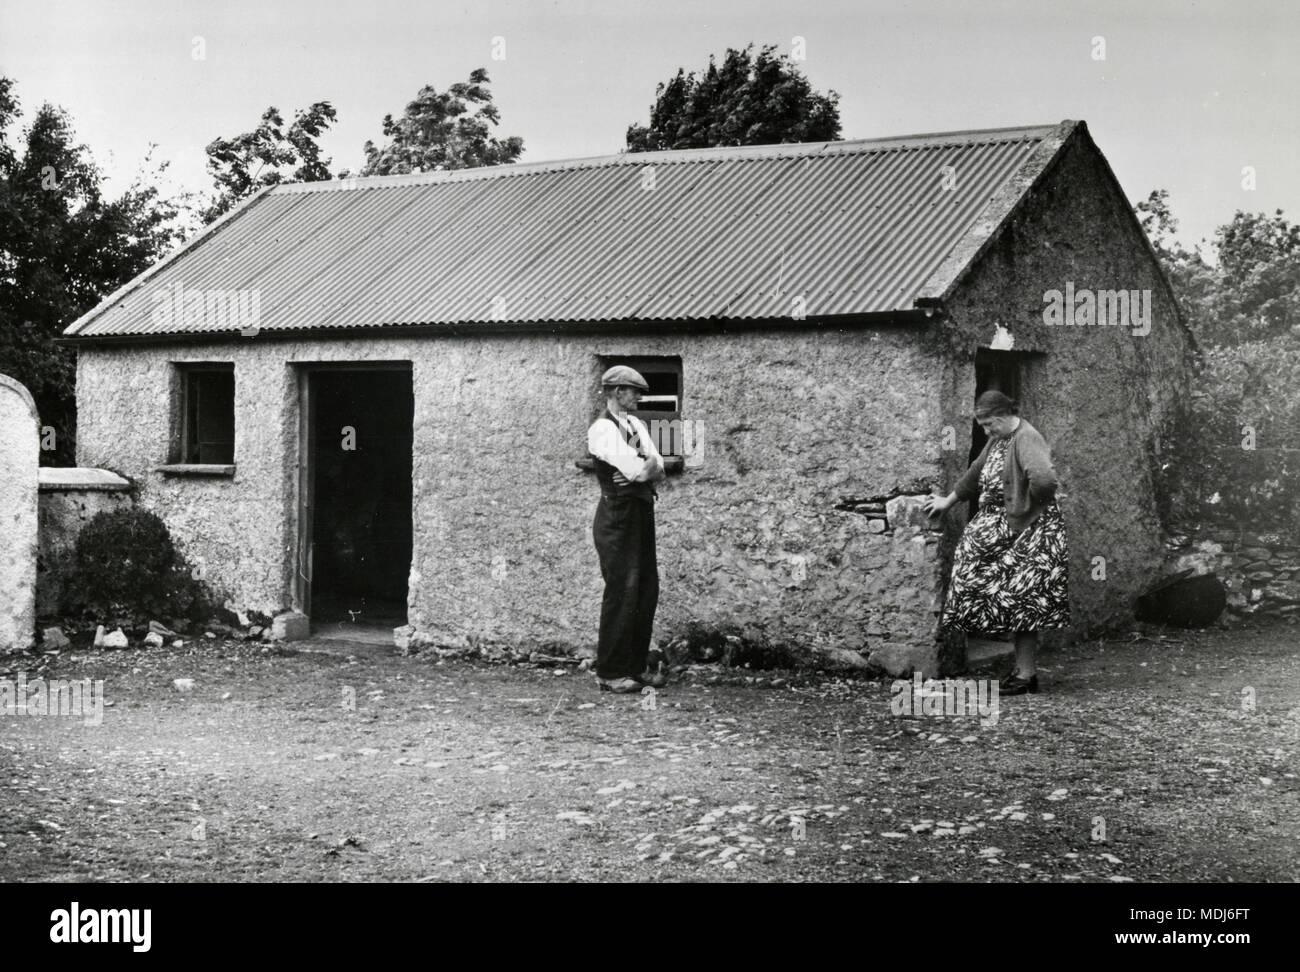 James Kennedy, cousin of JFK, in his Irish farmhouse, Dungenstown, Ireland - Stock Image